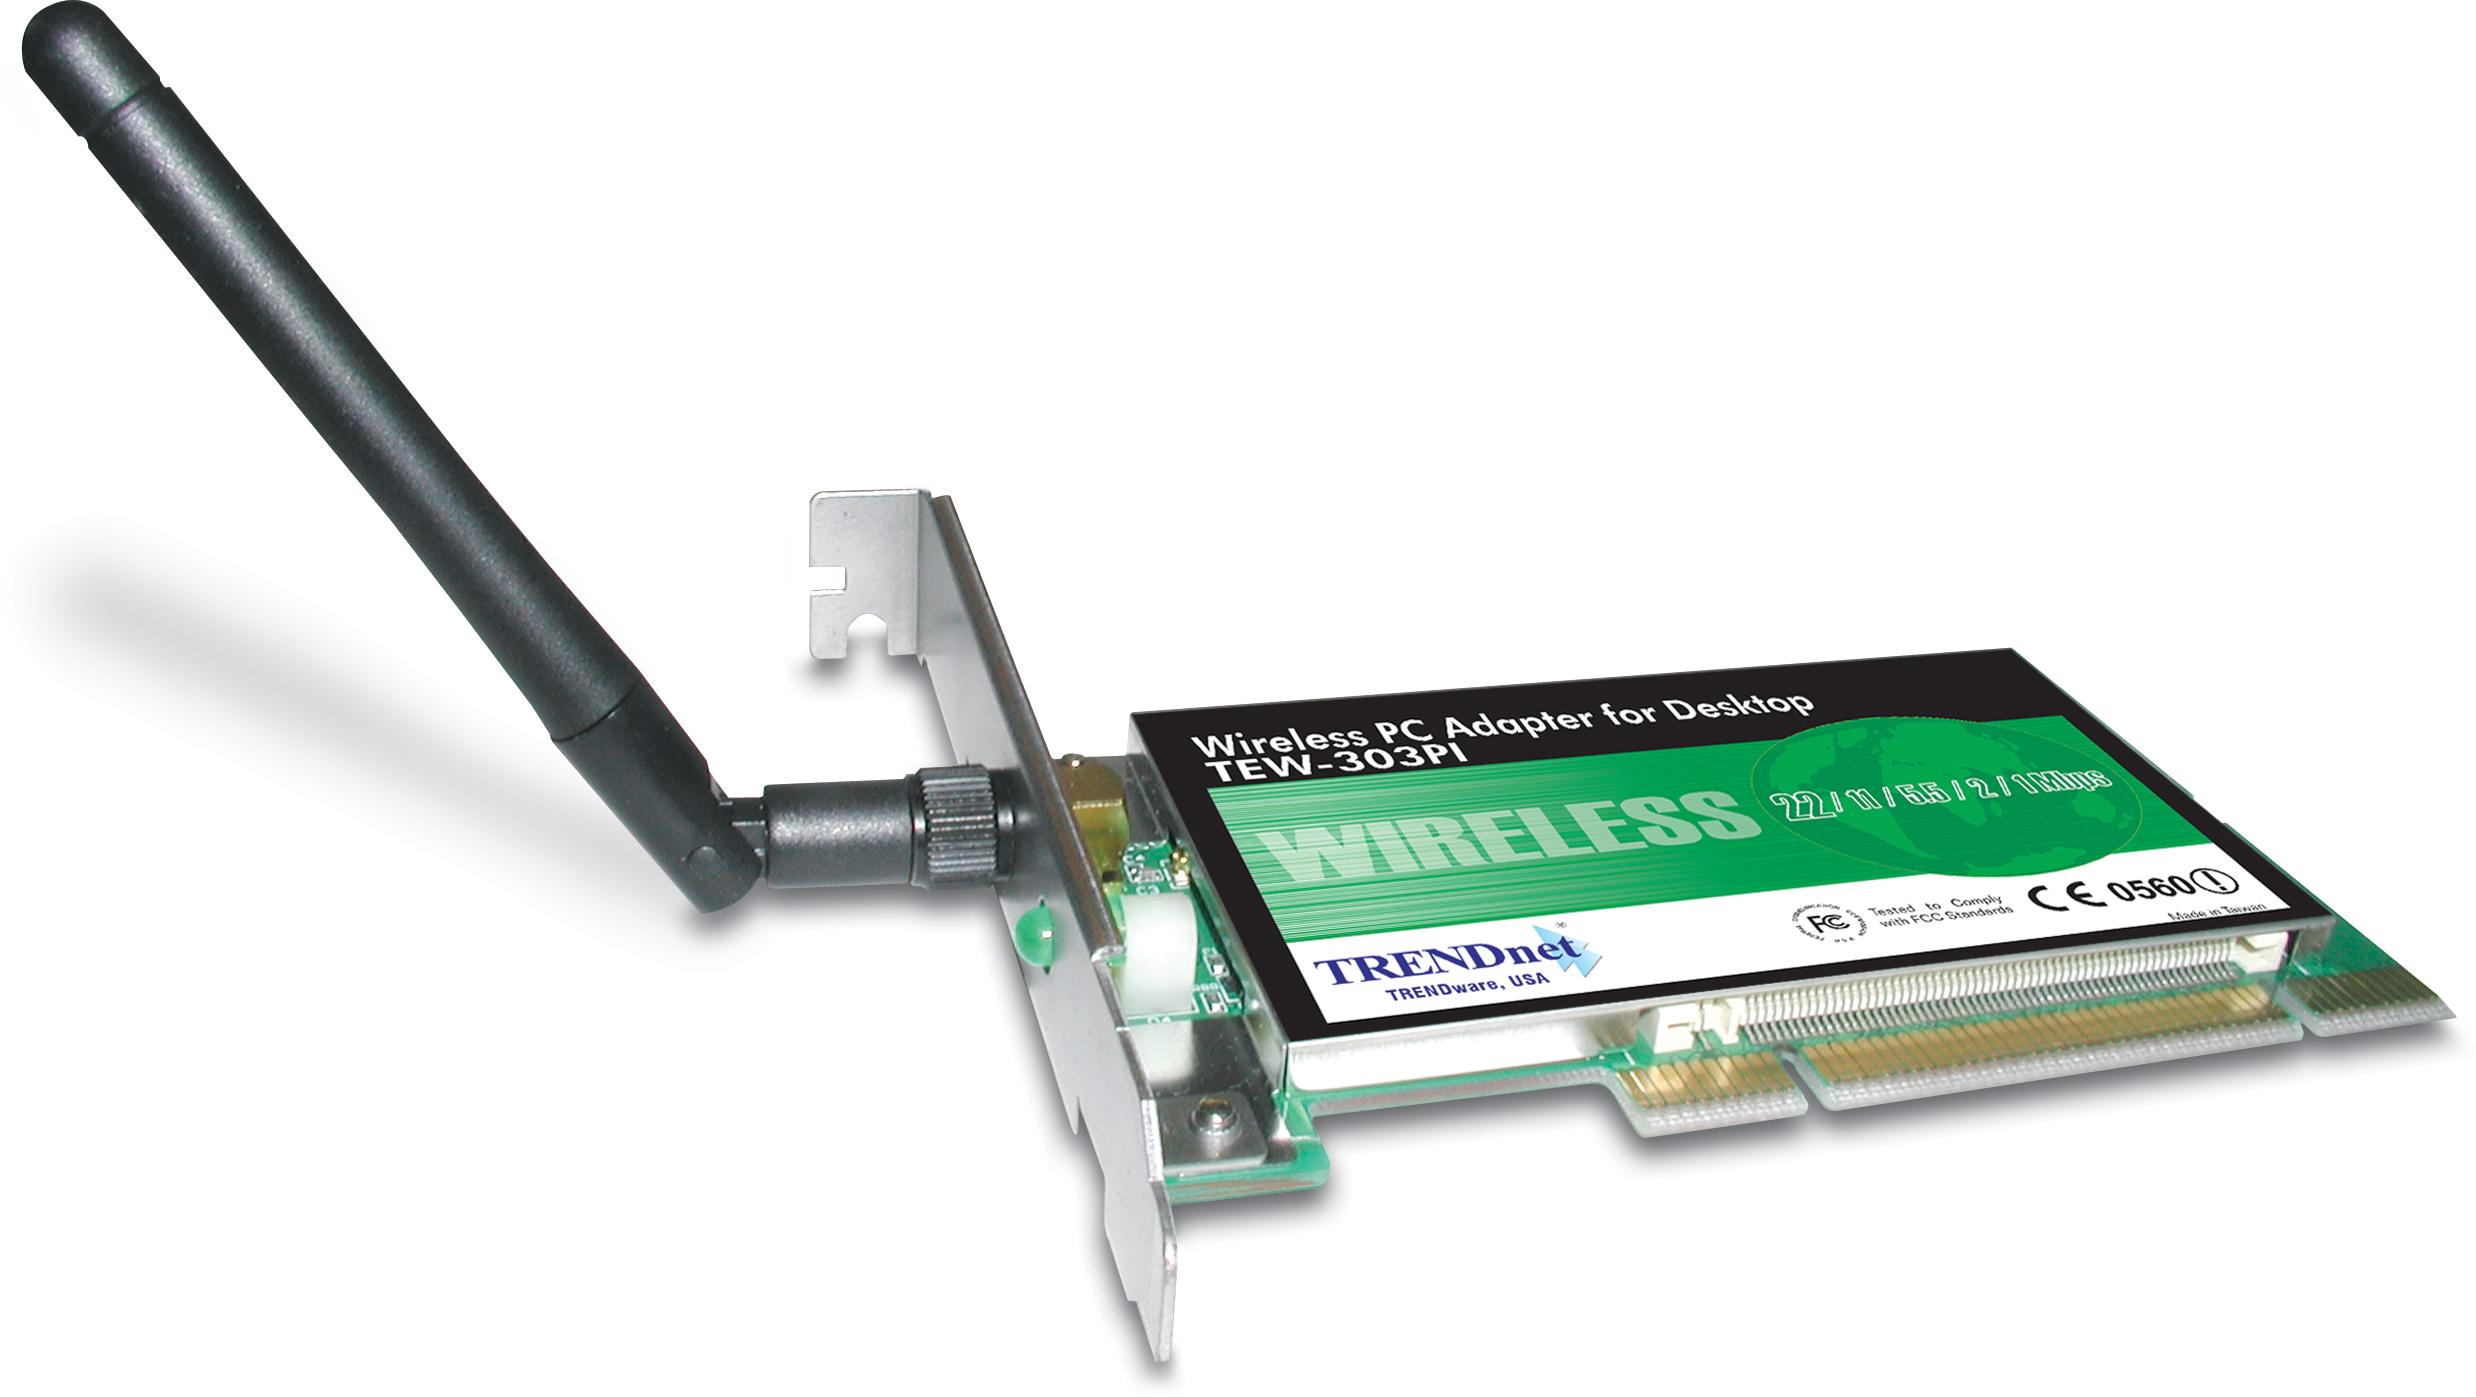 54Mbps Wireless G PCI Adapter - TRENDnet TEWPI